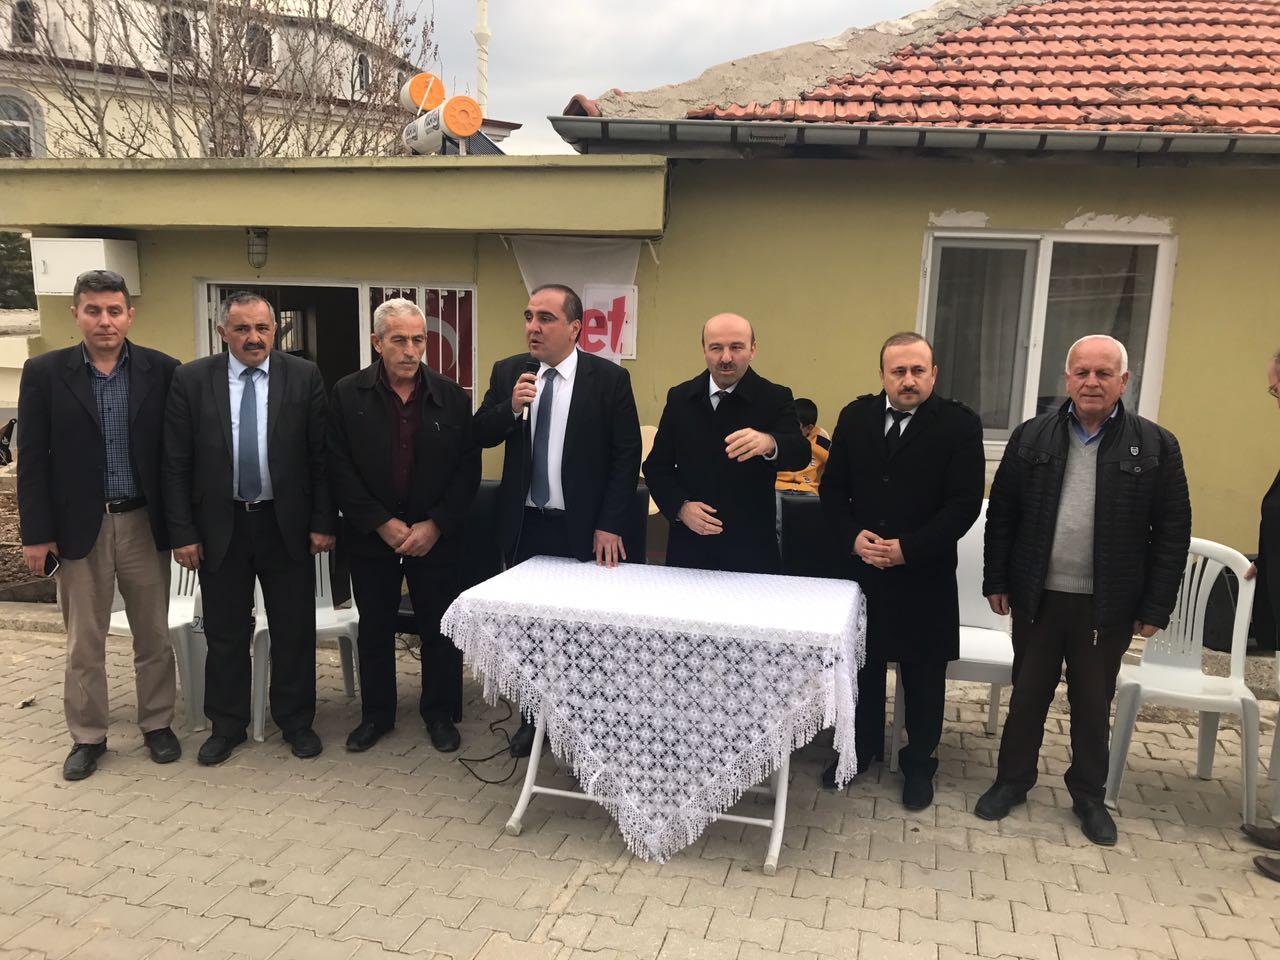 BAKAN YARDIMCISI TÜFEKCİ'DEN TAŞRA MAHALLELERE ZİYARET